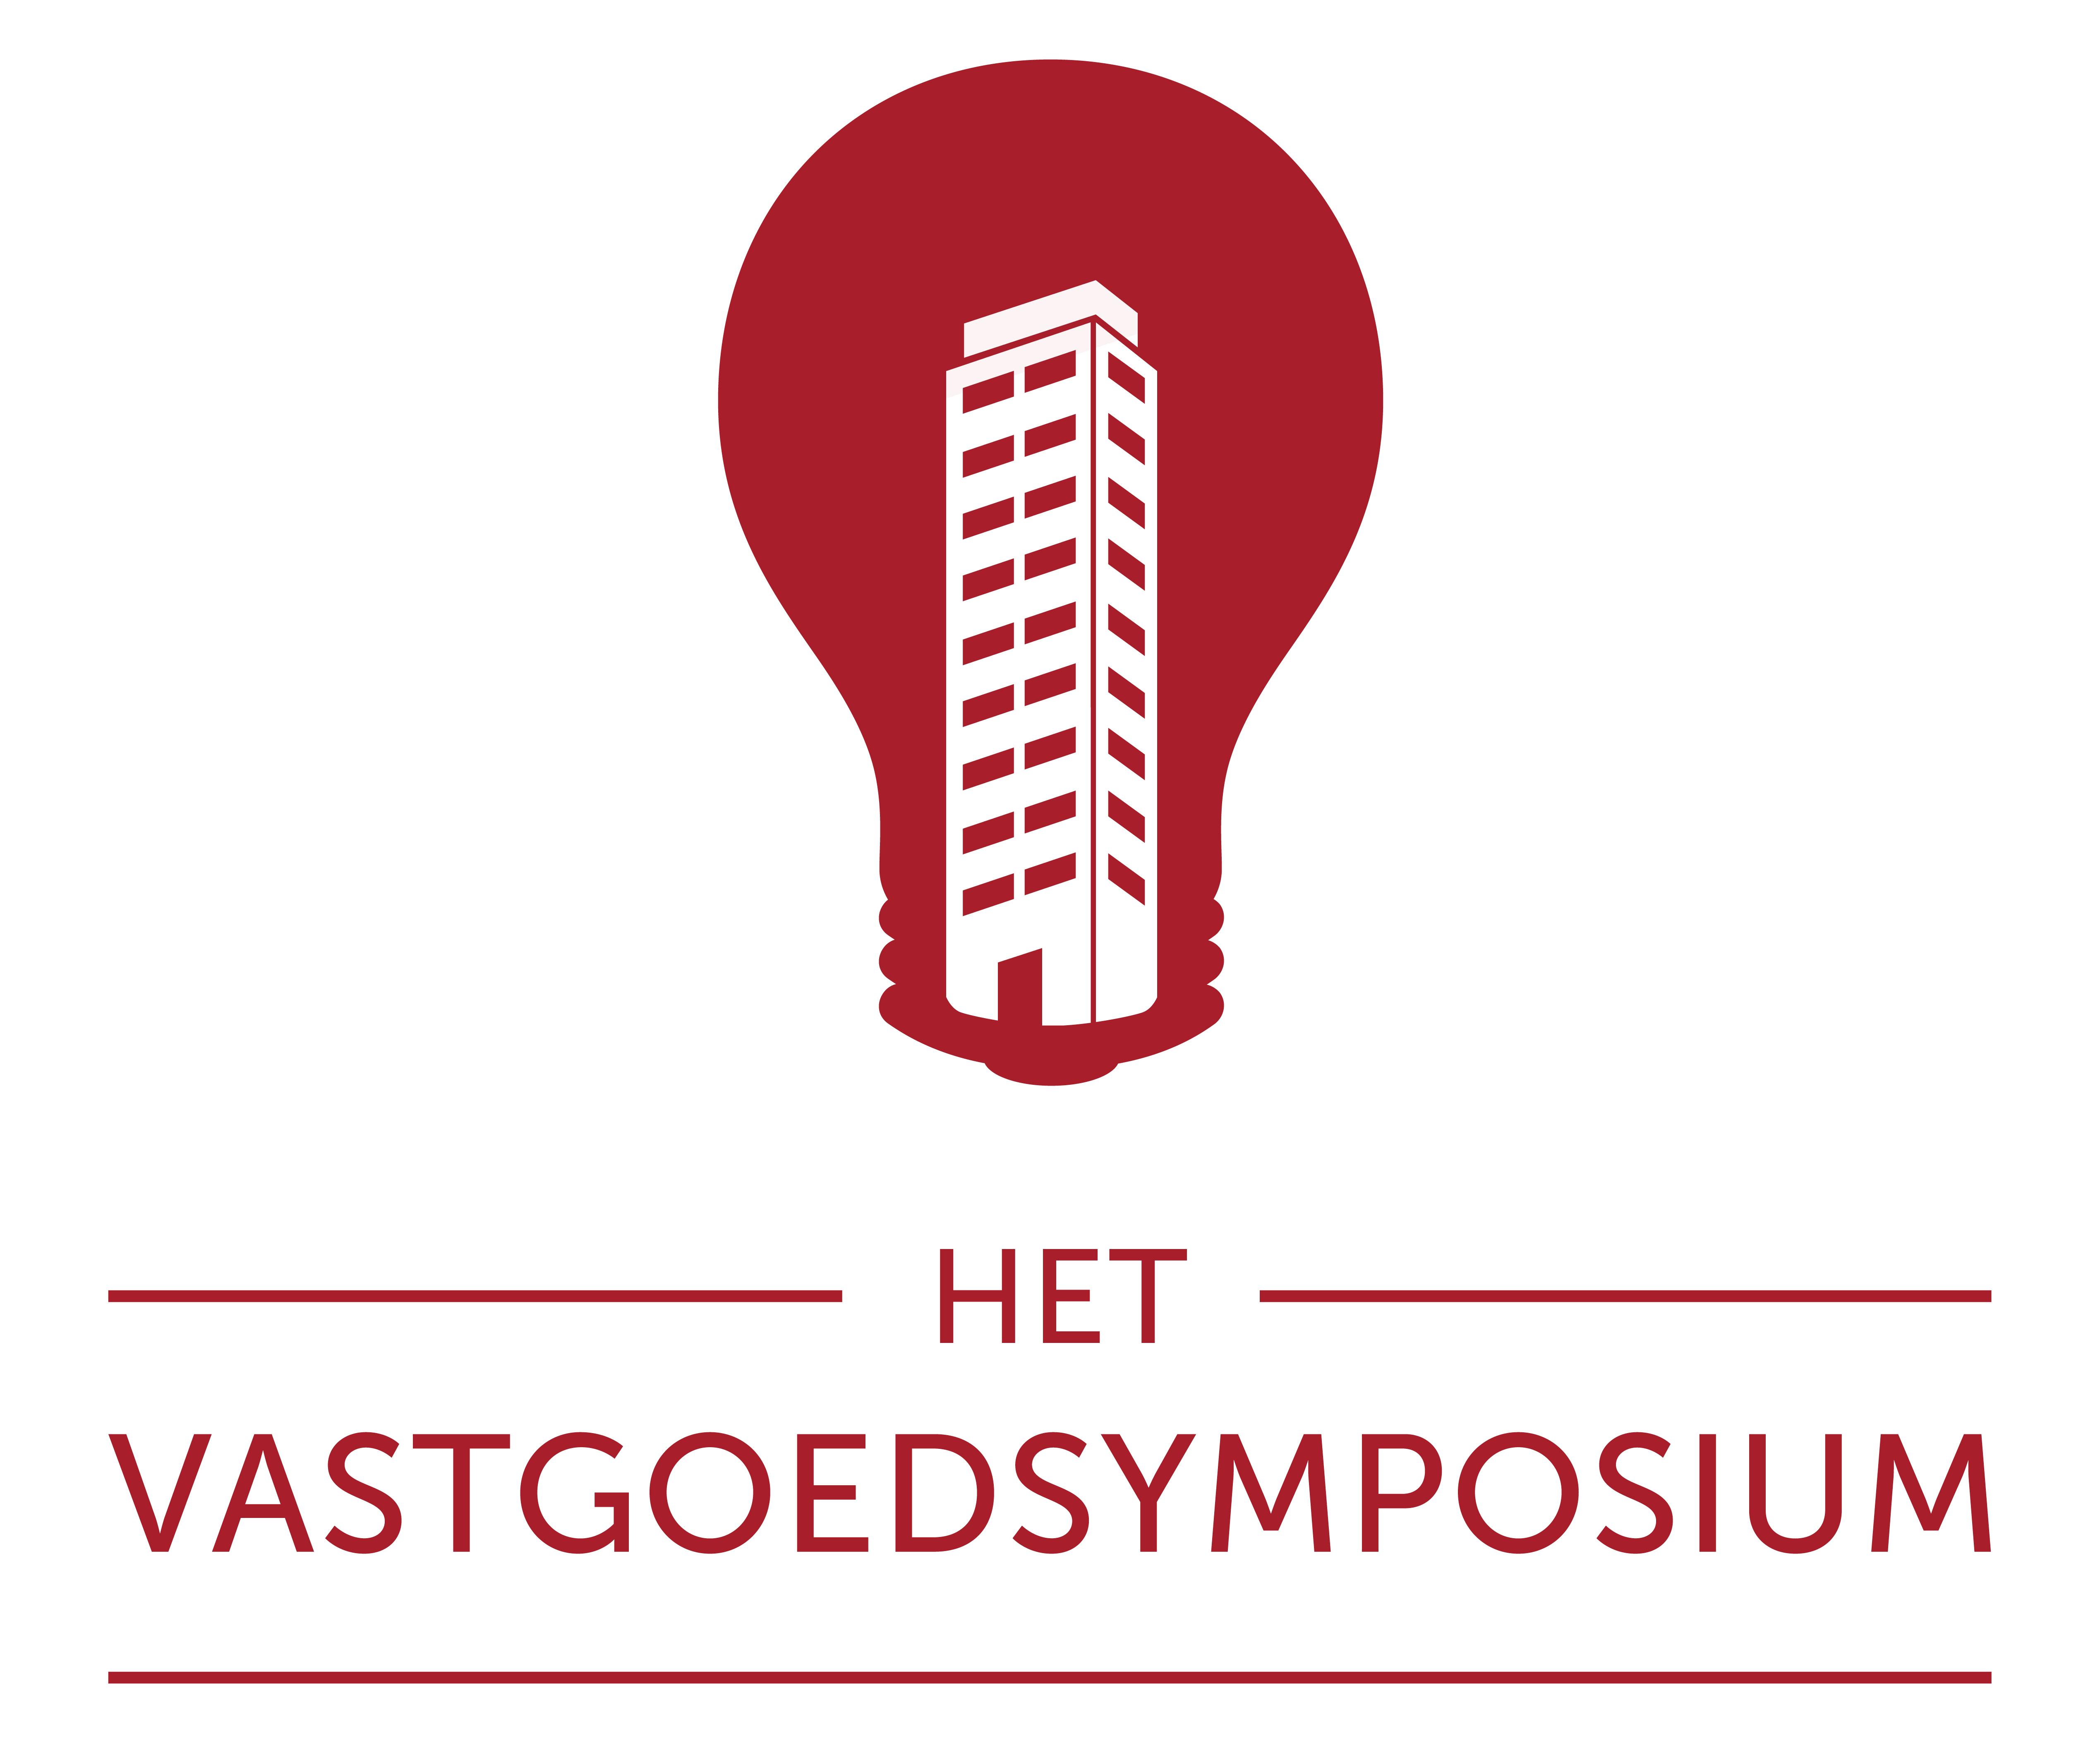 Het Vastgoedsymposium